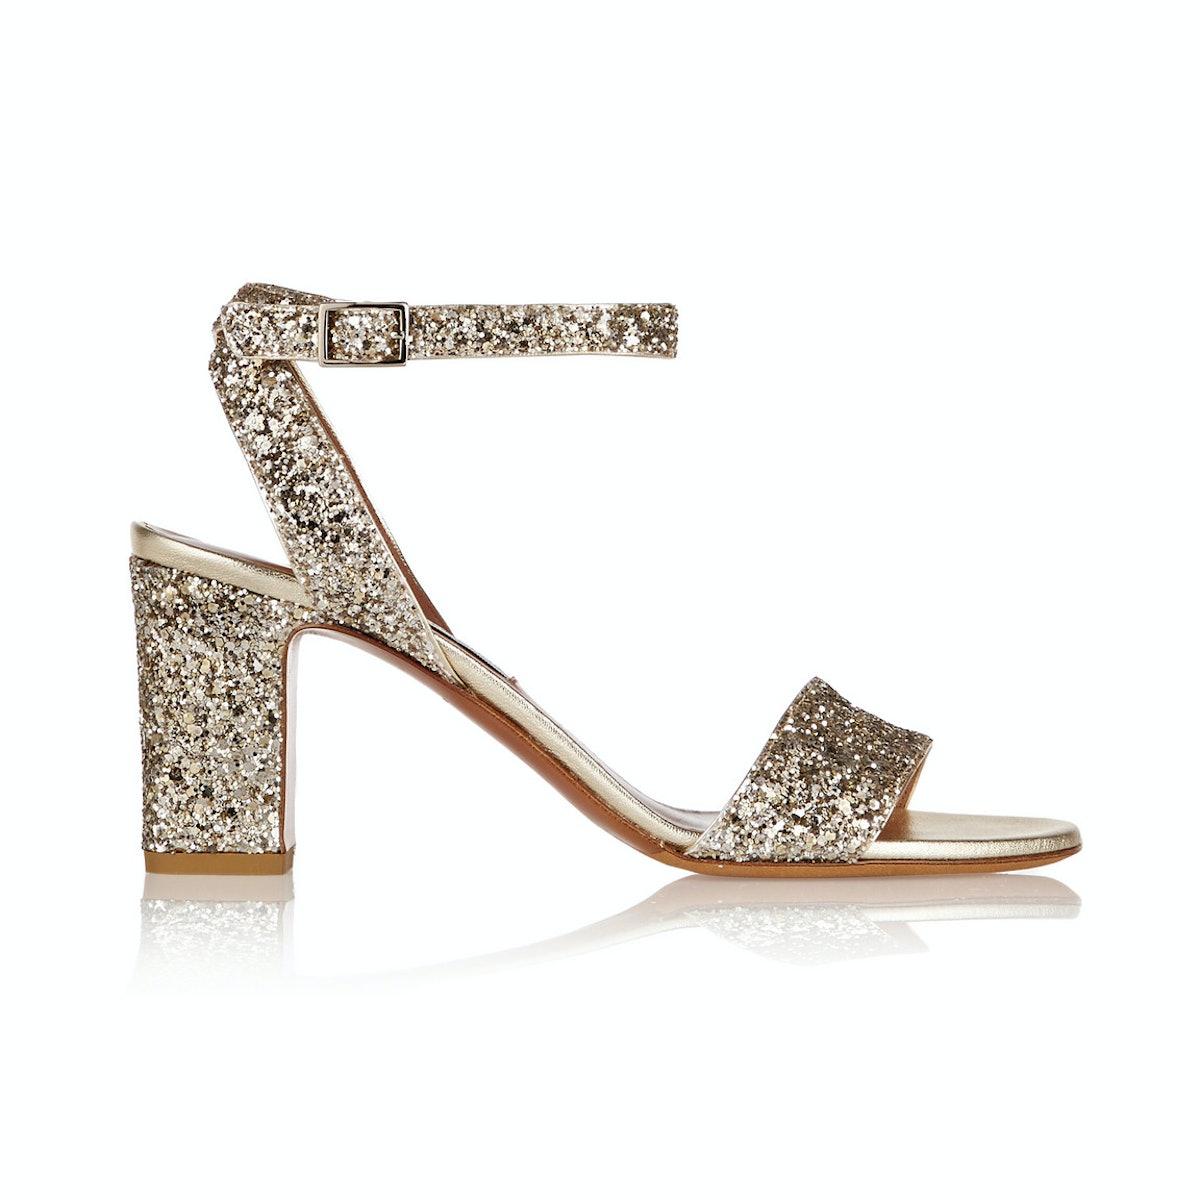 Tabitha Simmons sandals